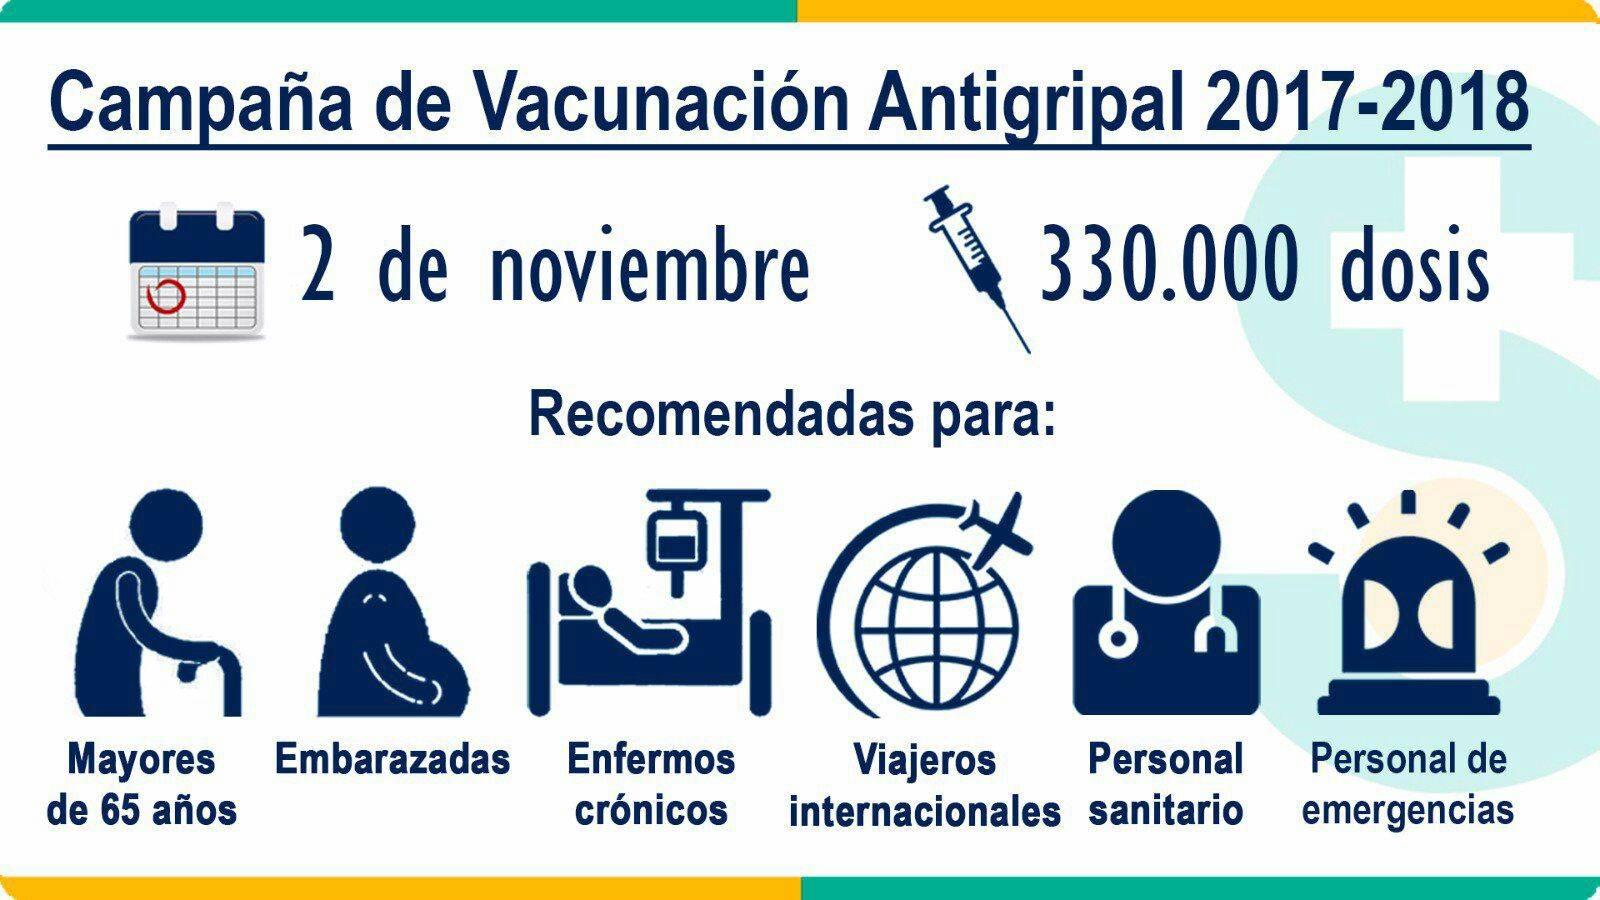 Campaña Antigripal 2017-2018 de Castilla-La Mancha